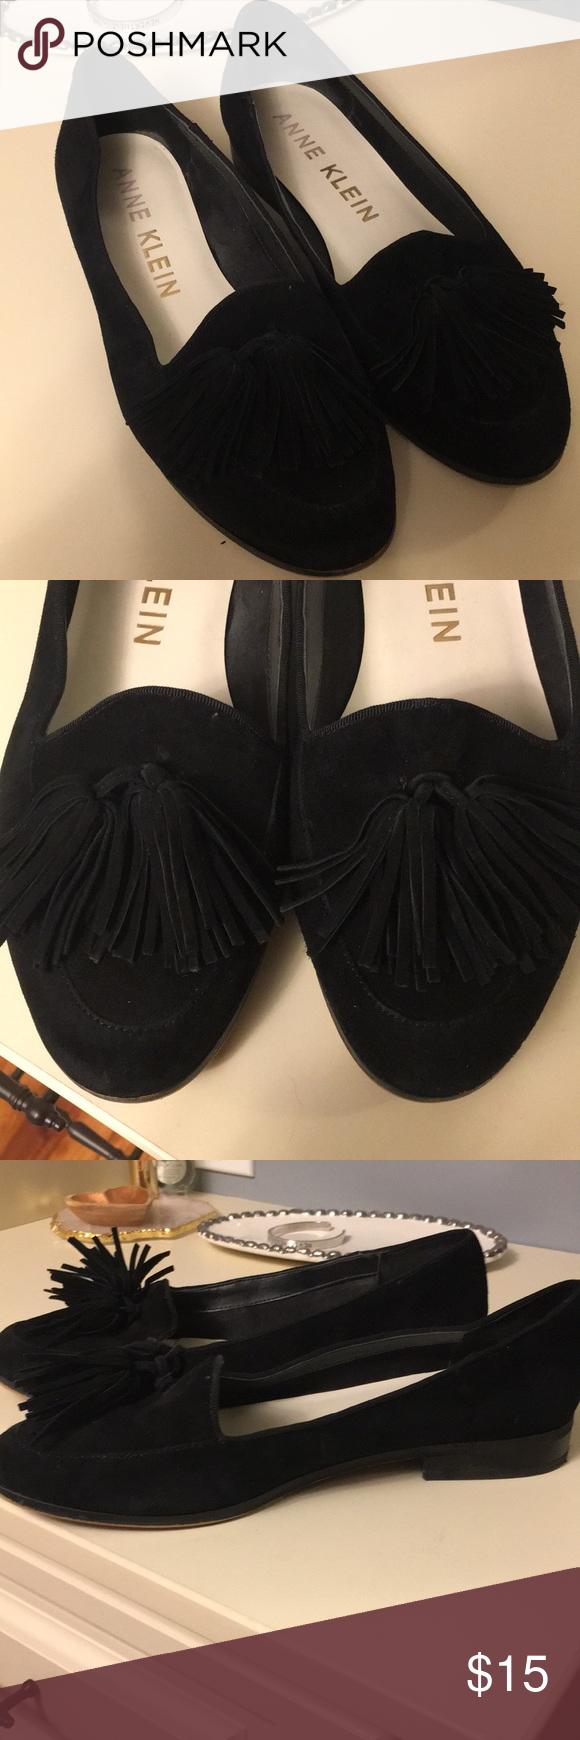 54de588c5c3 Anne Klein Darcy loafer Black loafer with tassel Anne Klein Shoes Flats    Loafers